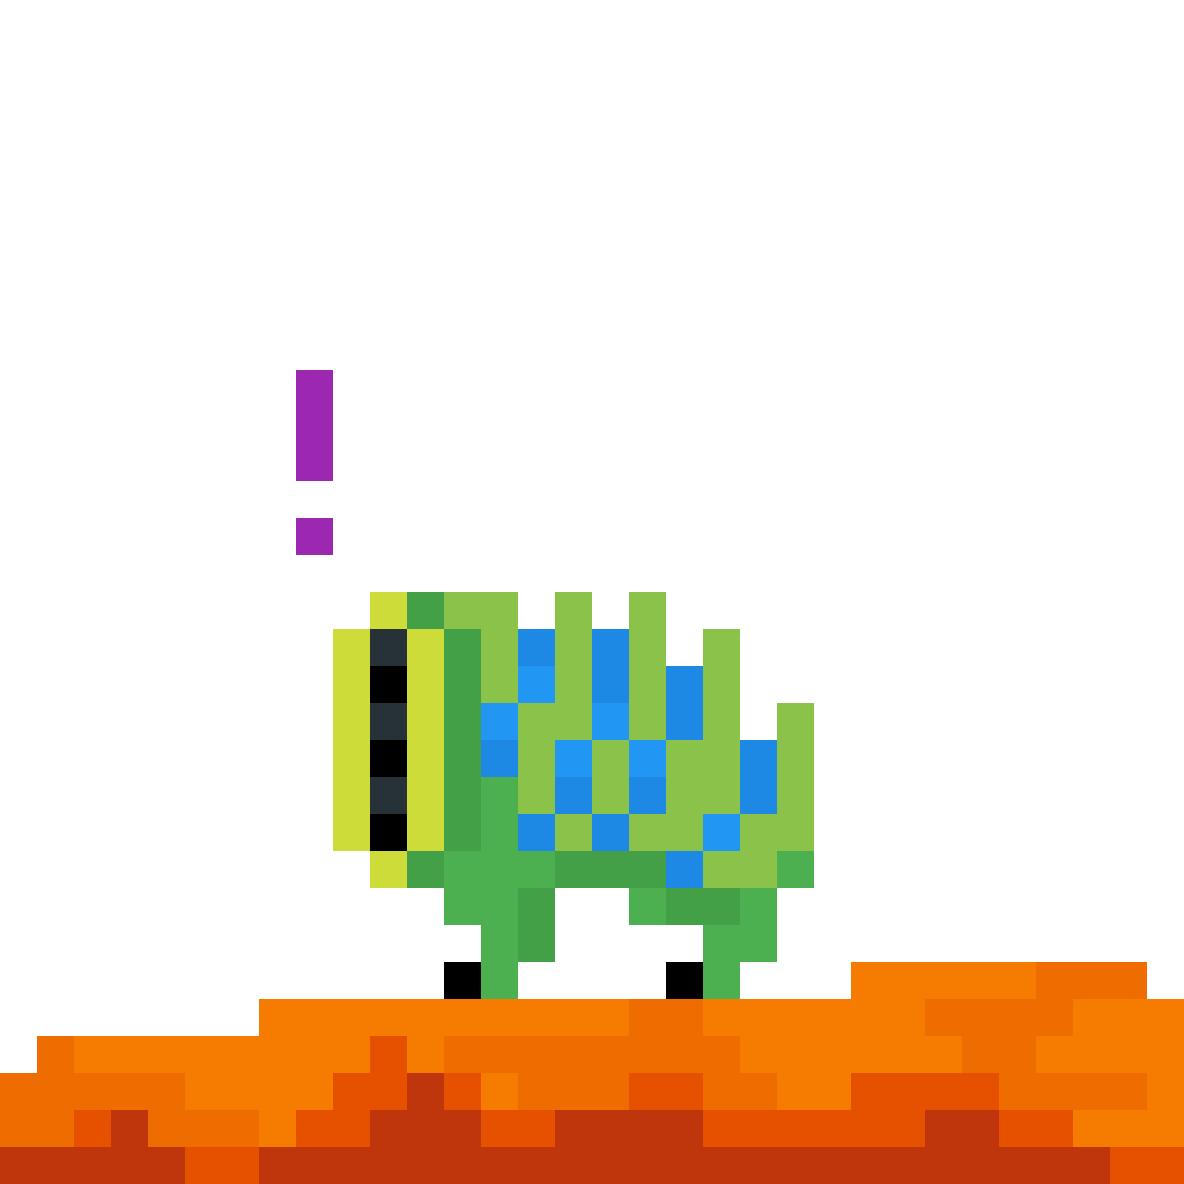 pixel houndeye! by robotboredom